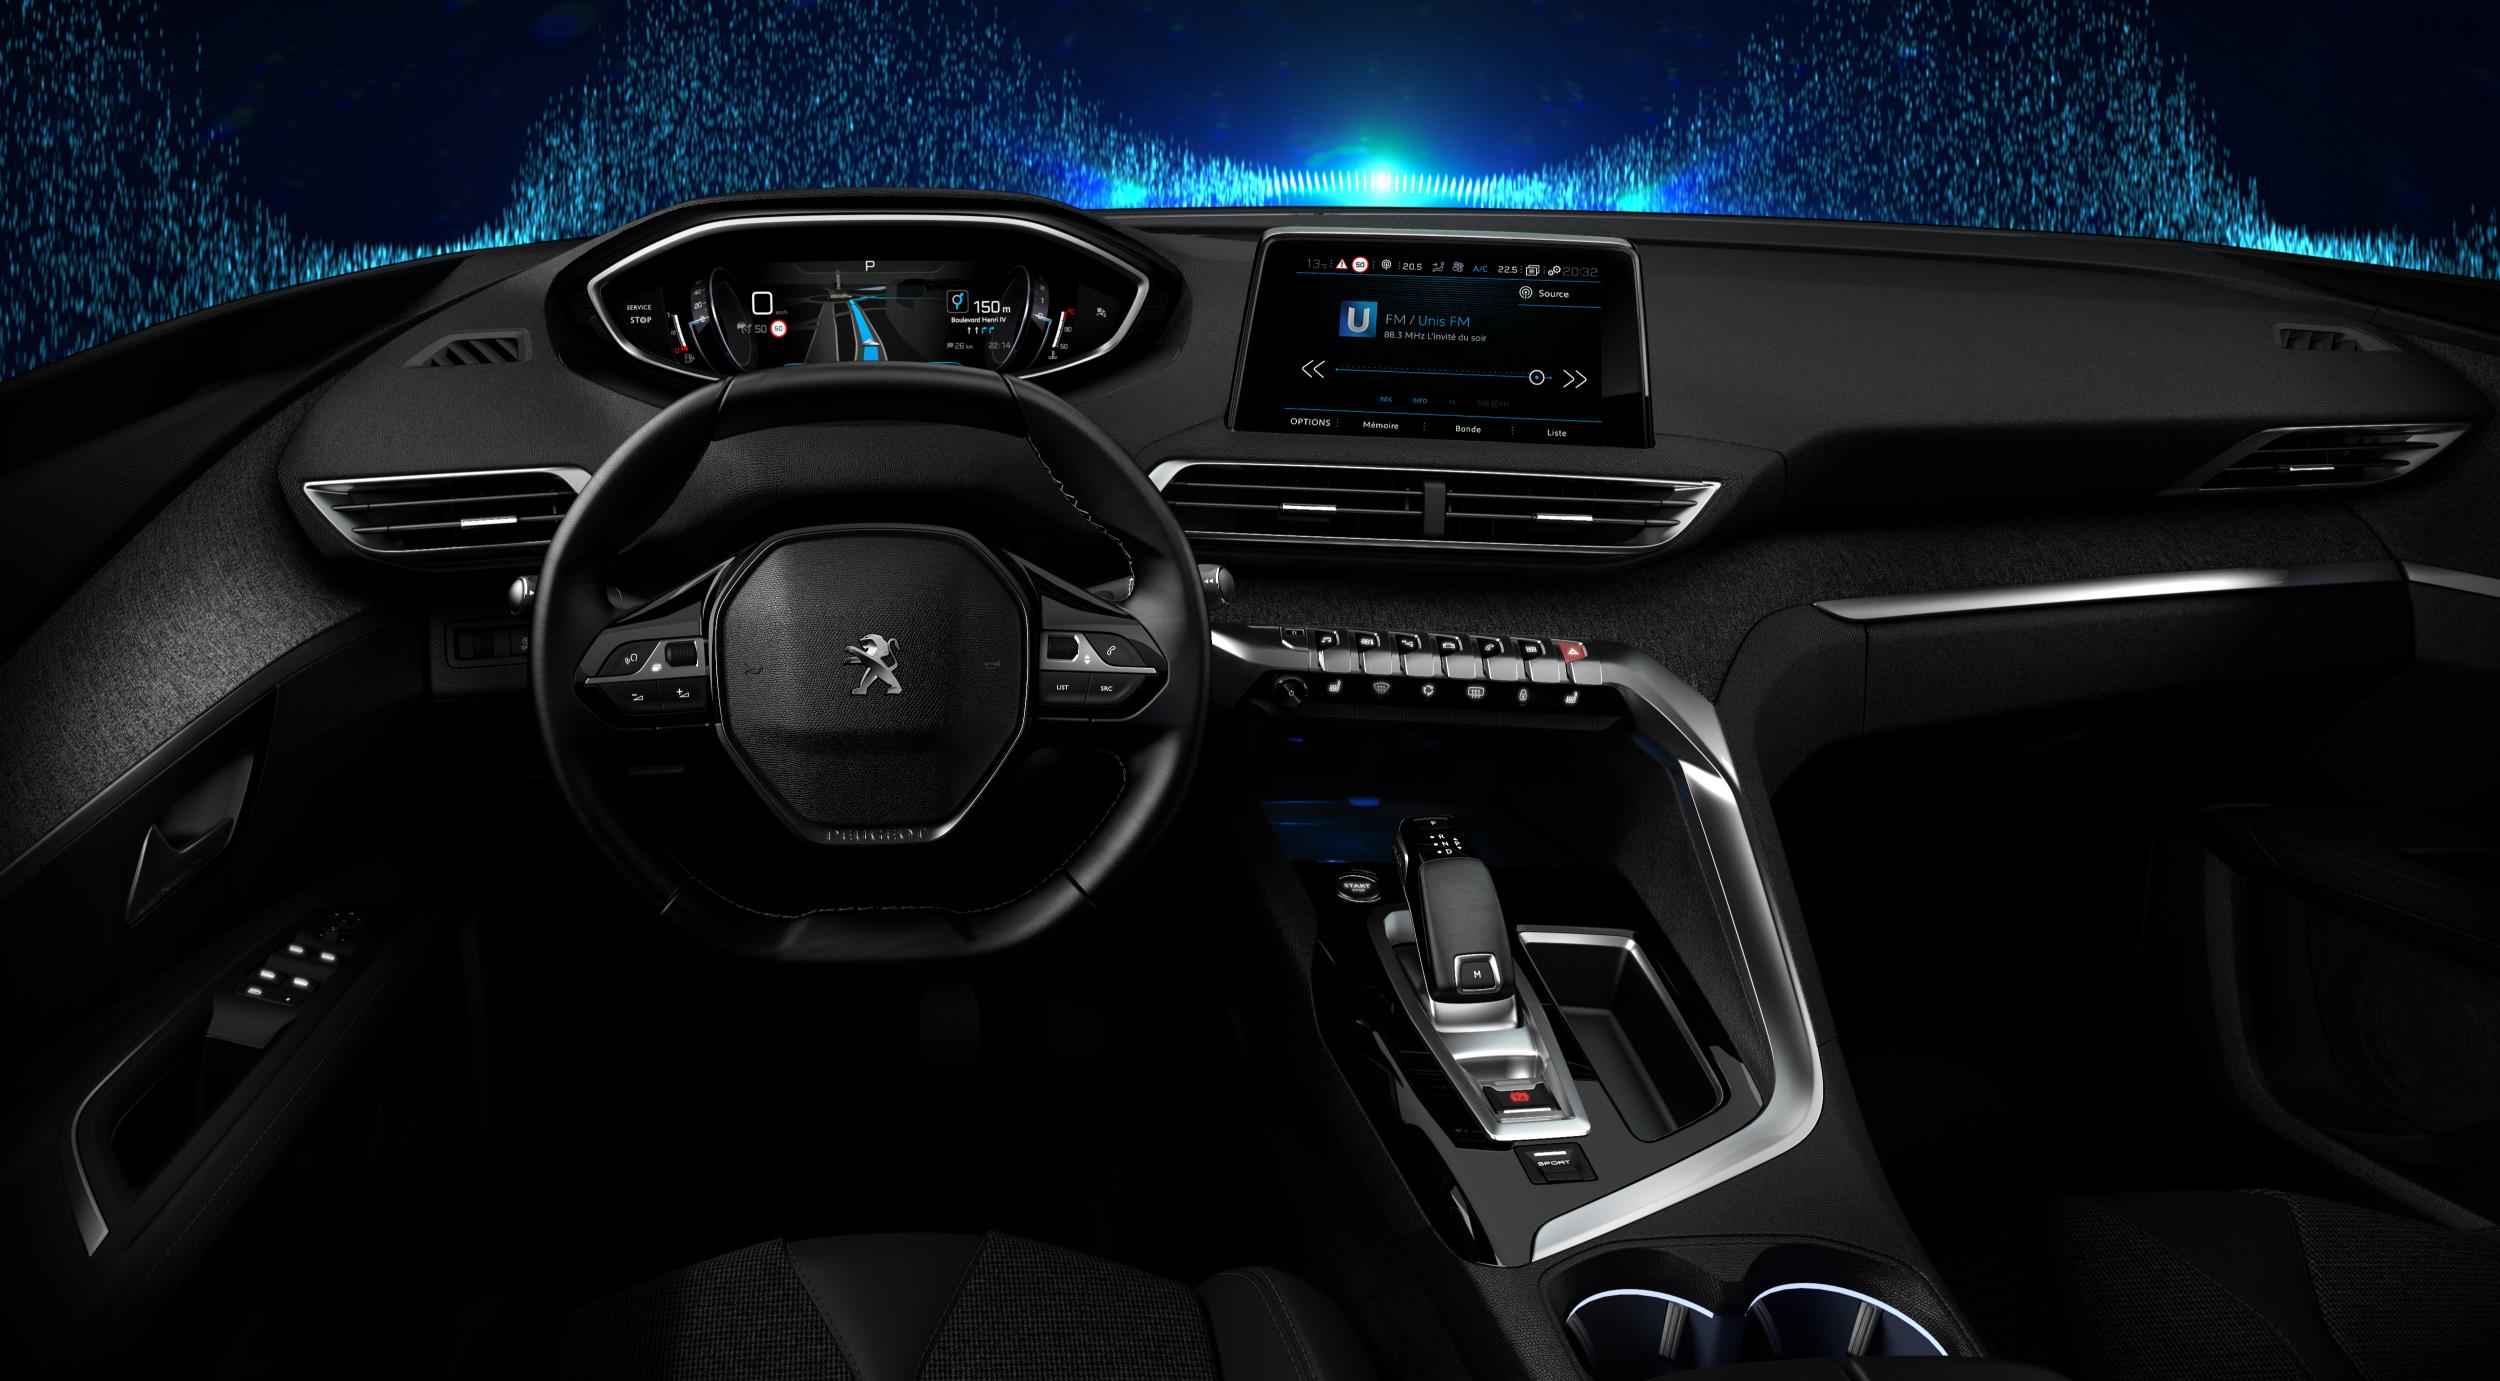 Peugeot i-Cockpit 1